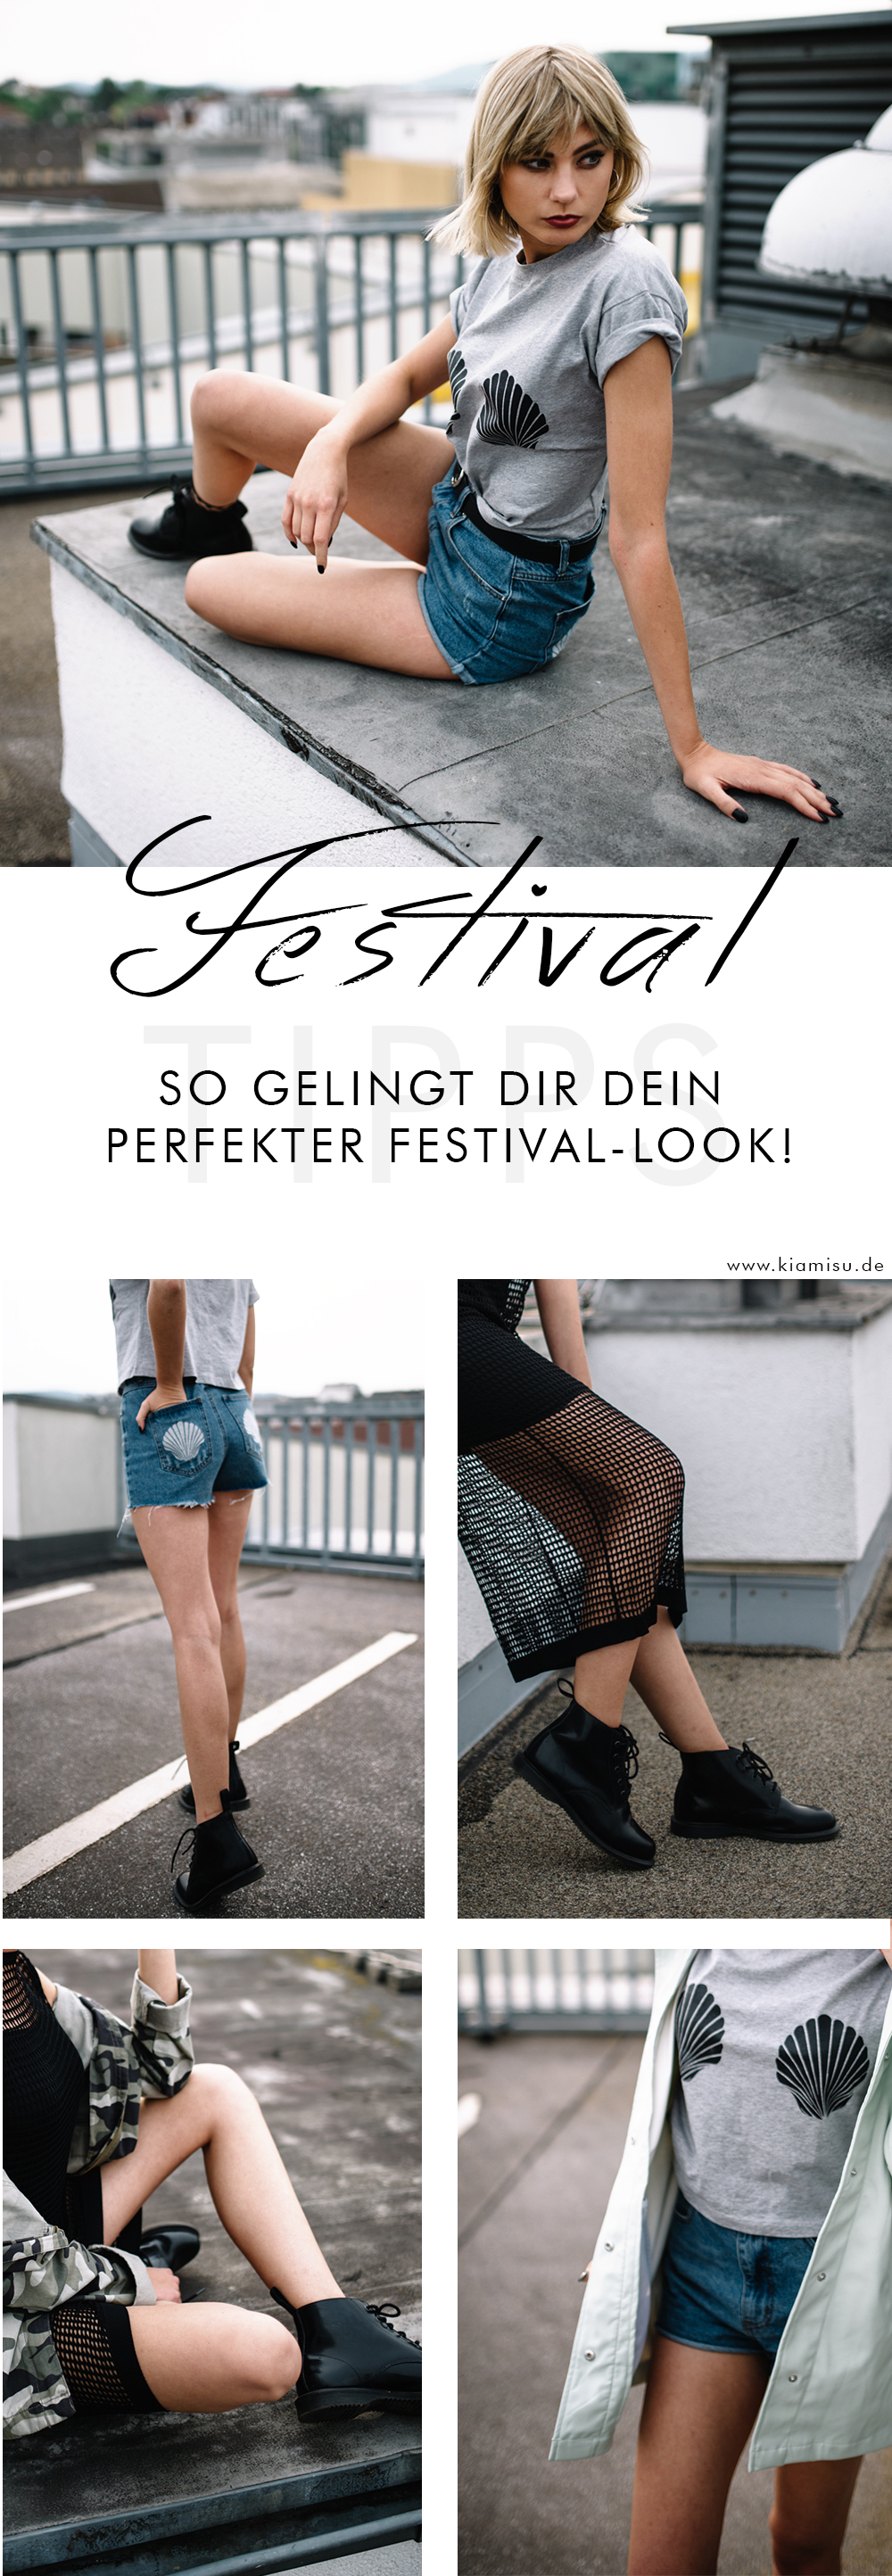 Festival-Trends kombinieren: So gelingt dir dein perfekter Festival-Look!